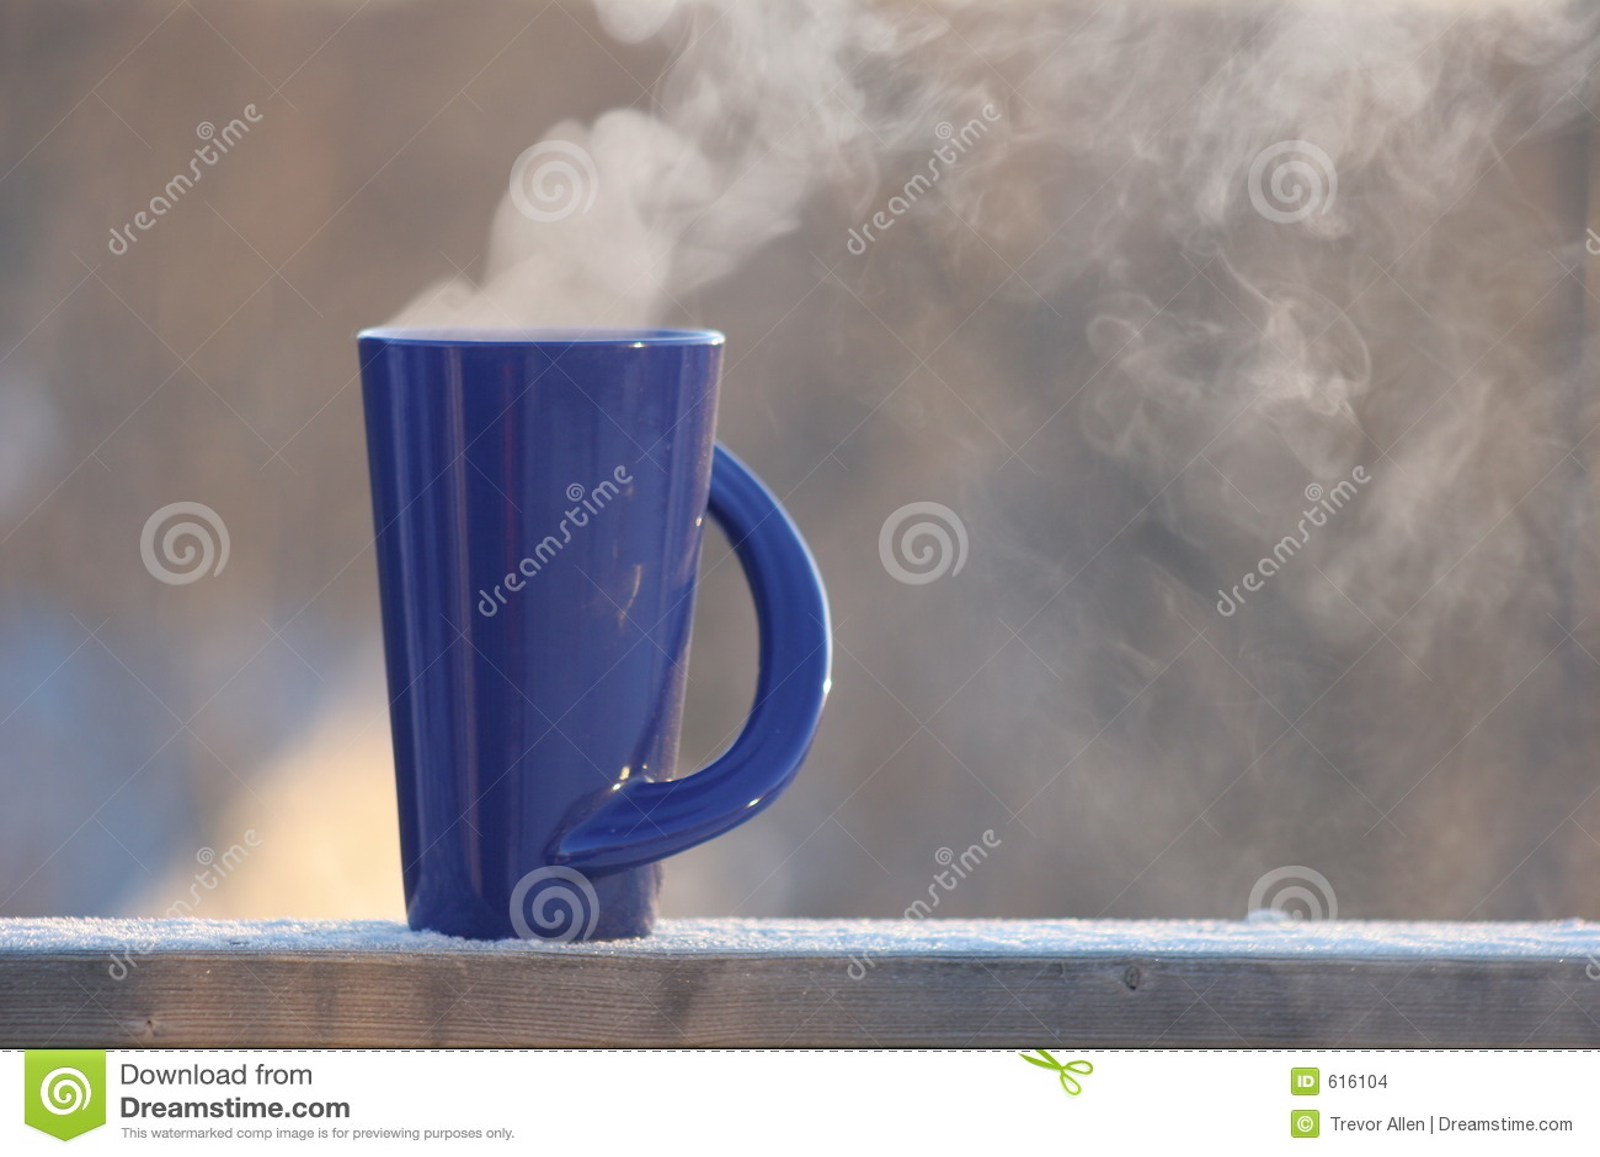 Coffee, Tea or Hot Chocolate